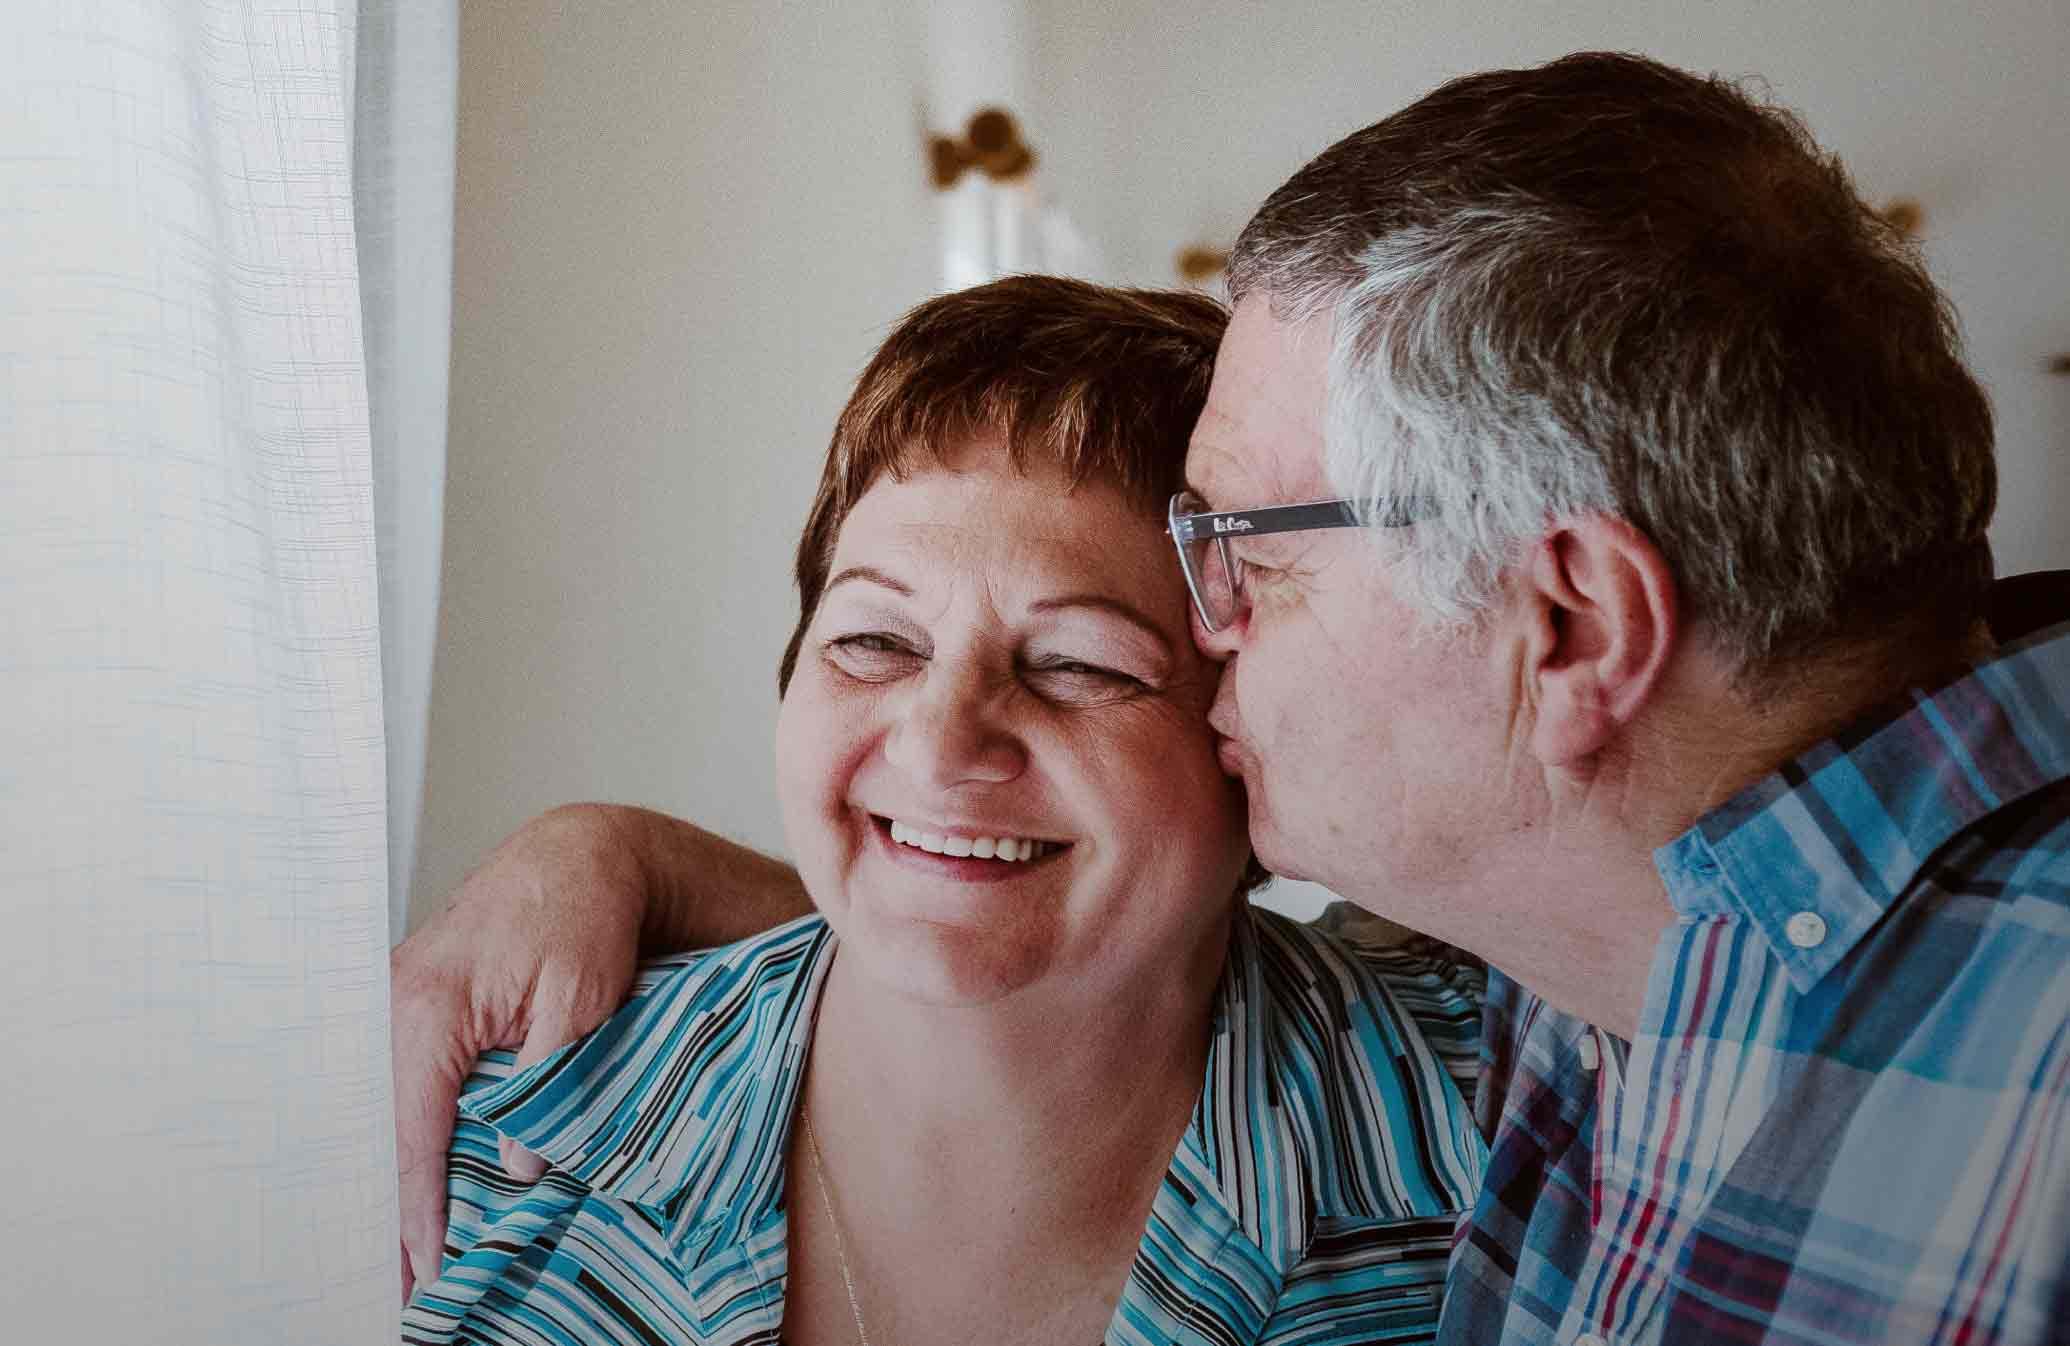 Improving Medication Adherence Through a Year-Long Engagement Program